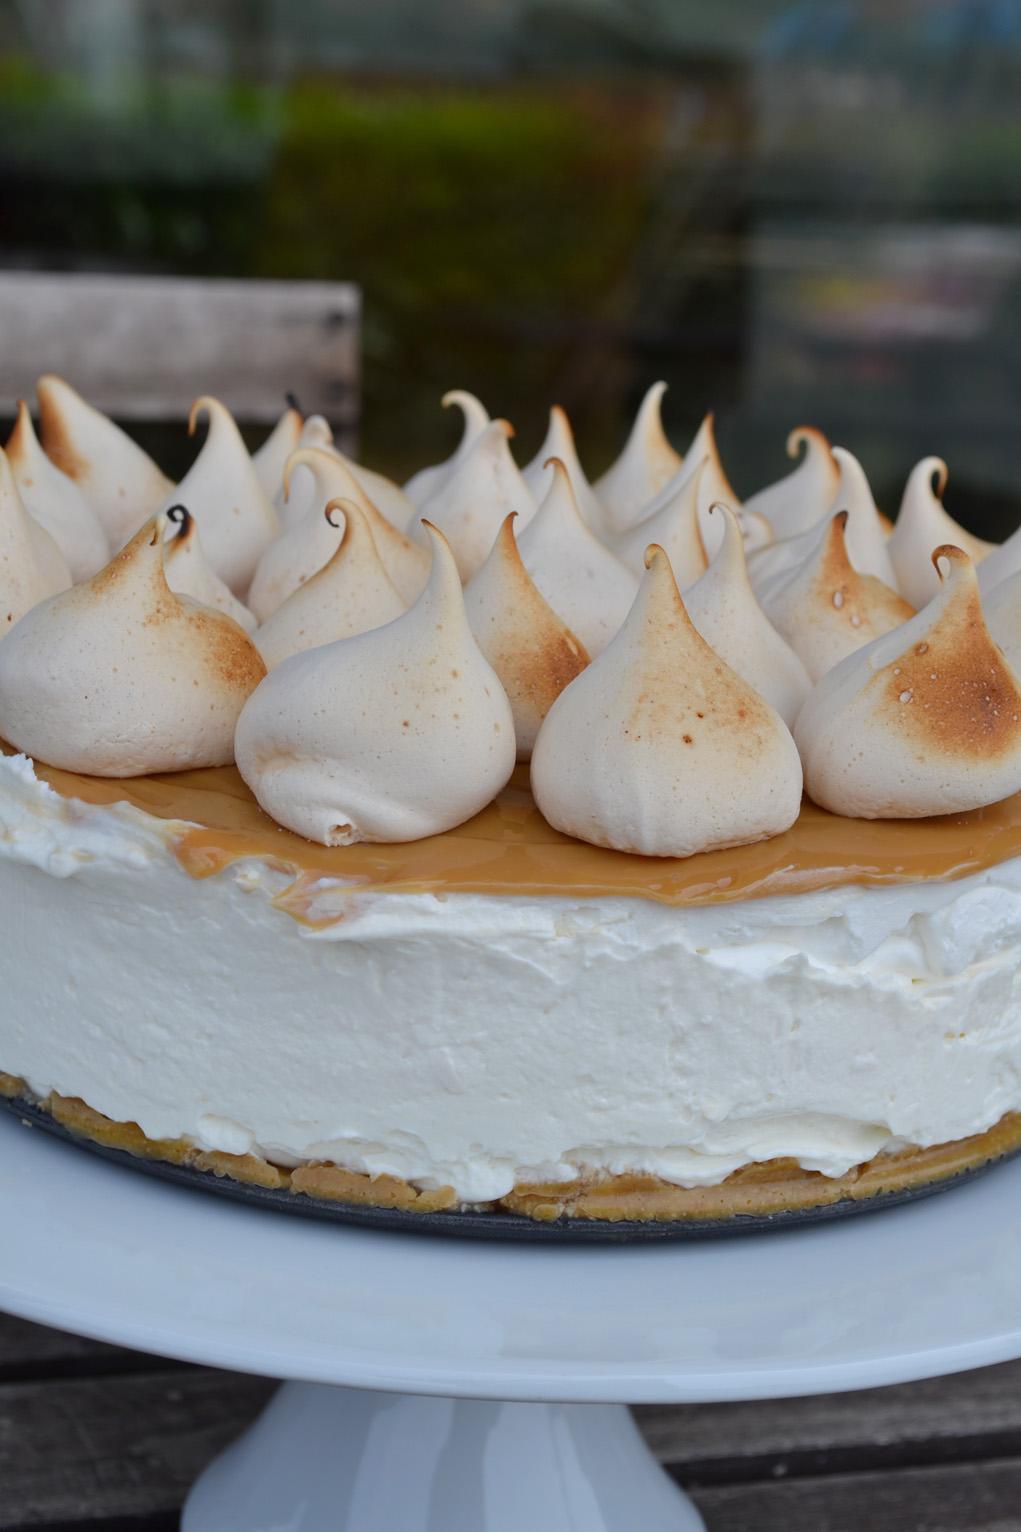 caramel cheesecake DSC_0044